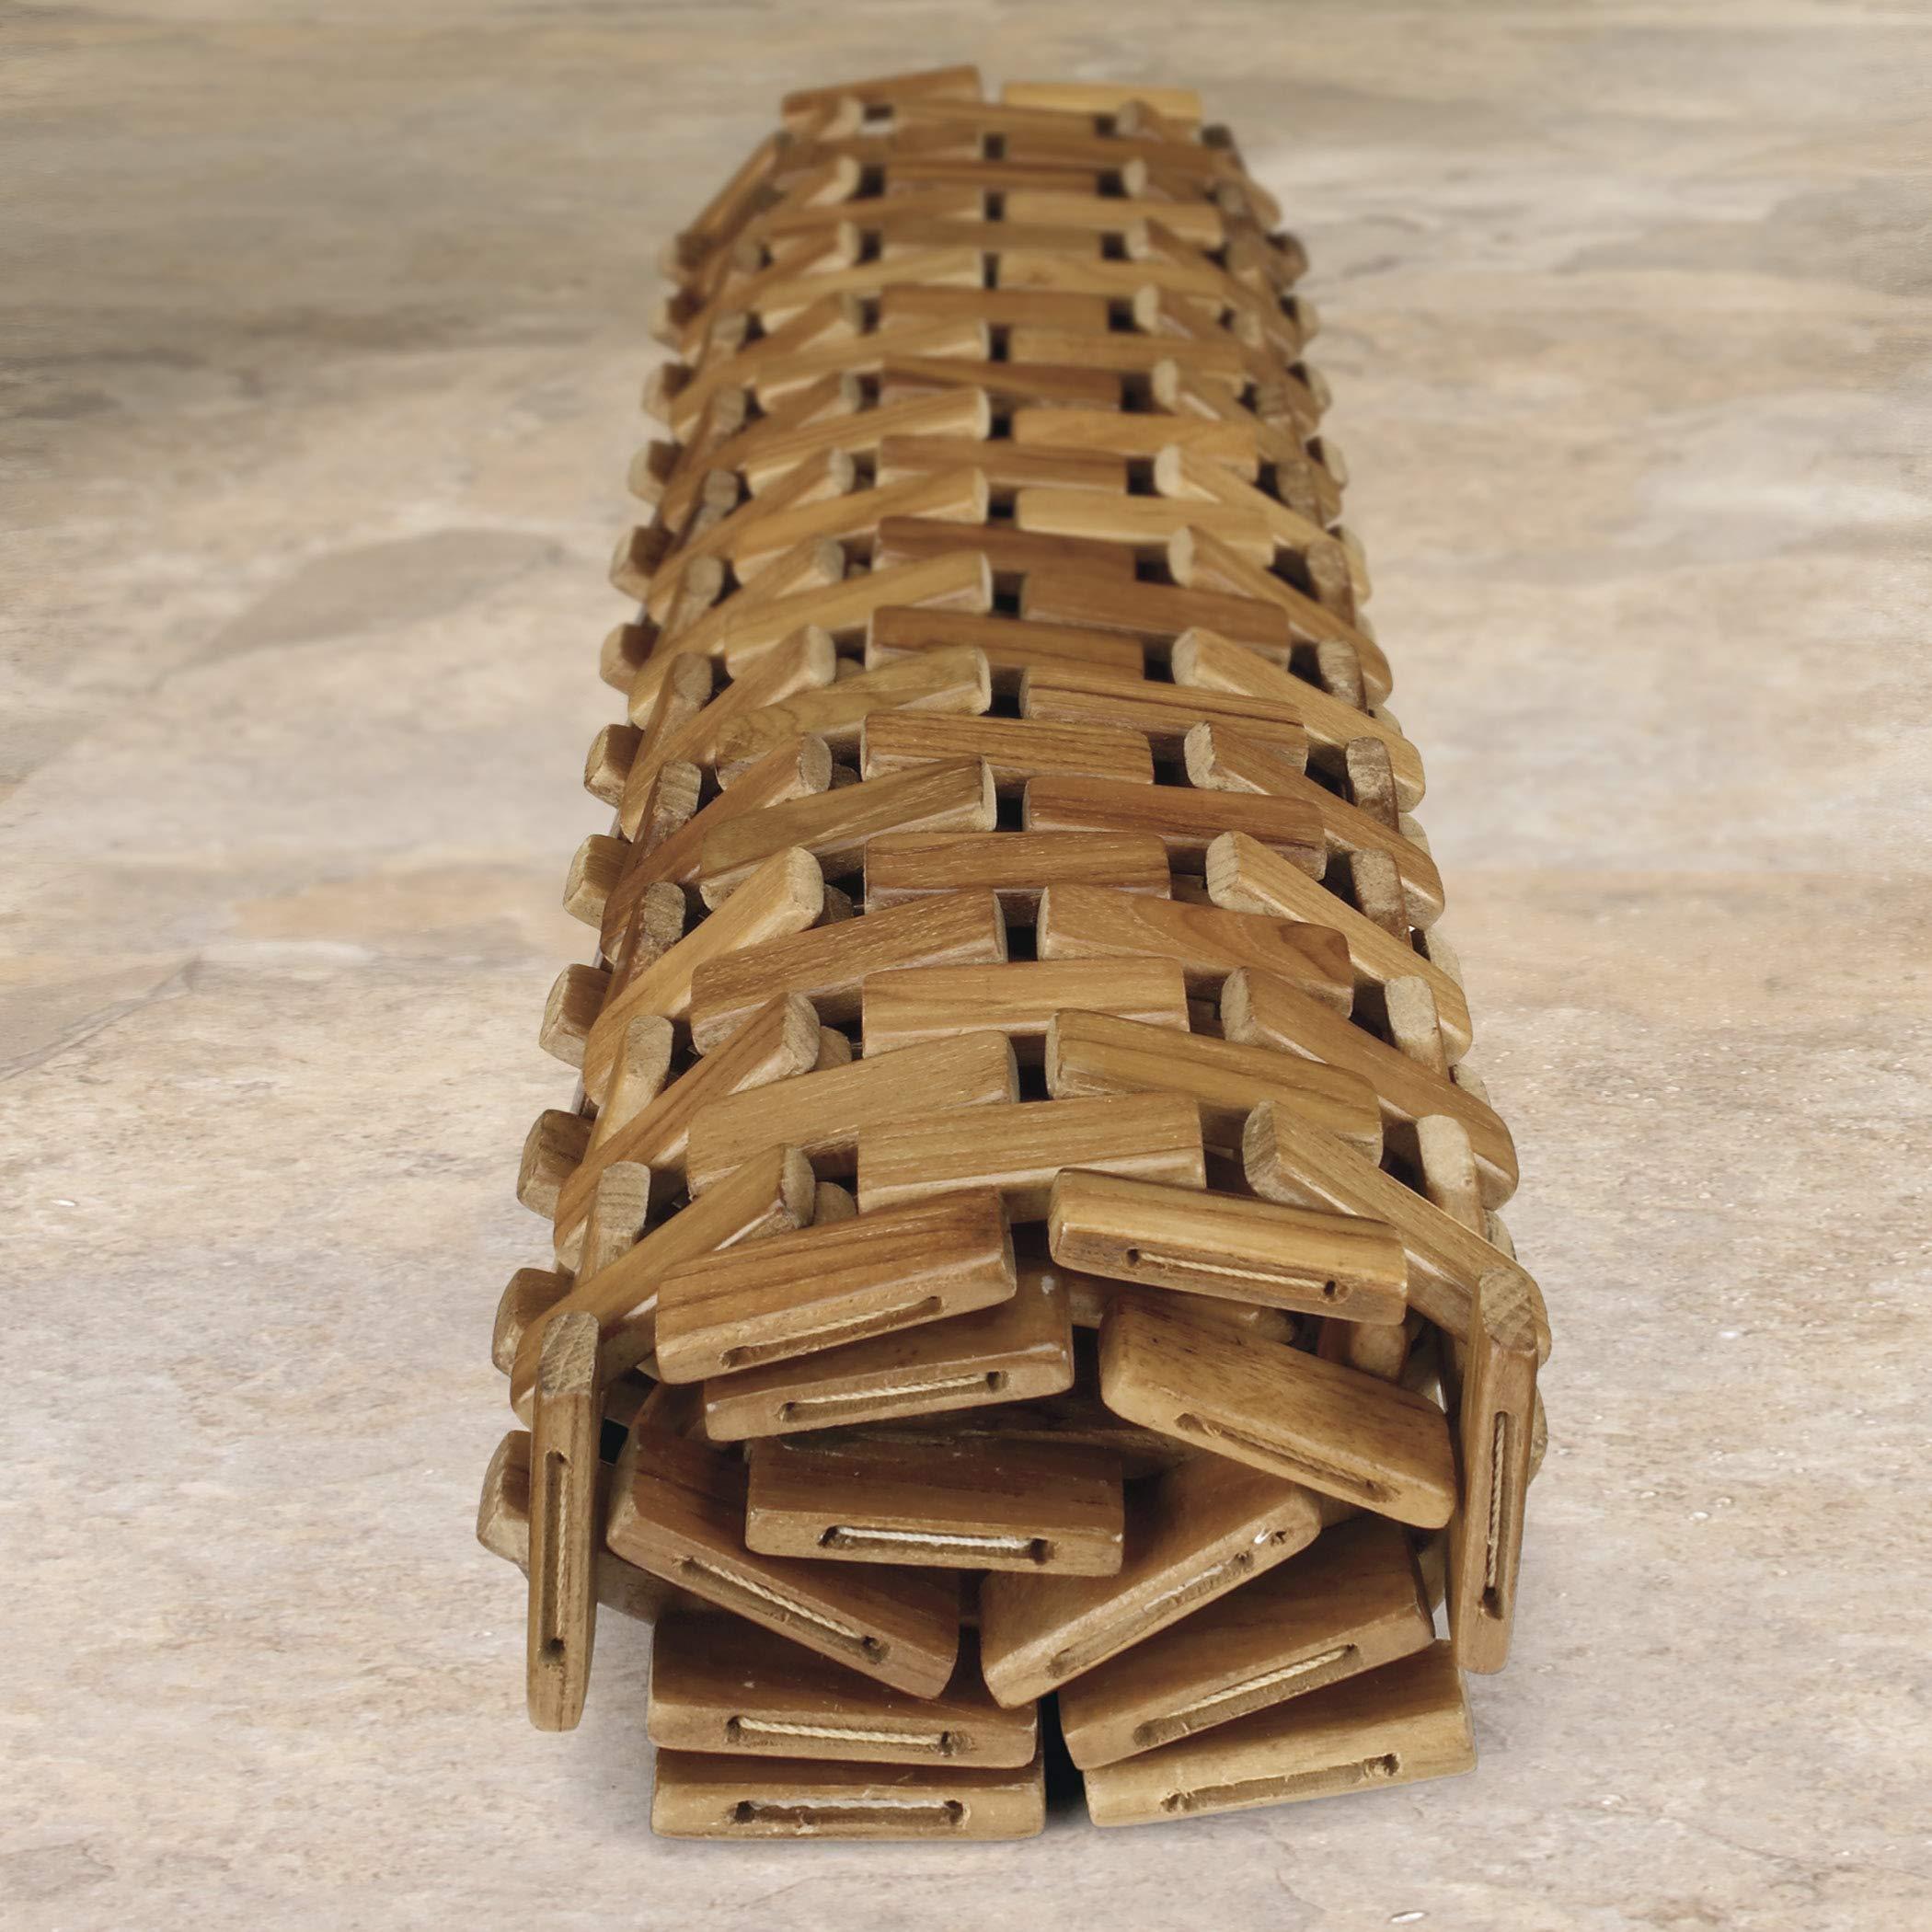 Conair Home Teak Spa Mat, Roll-Up or Lay Flat by Conair (Image #4)